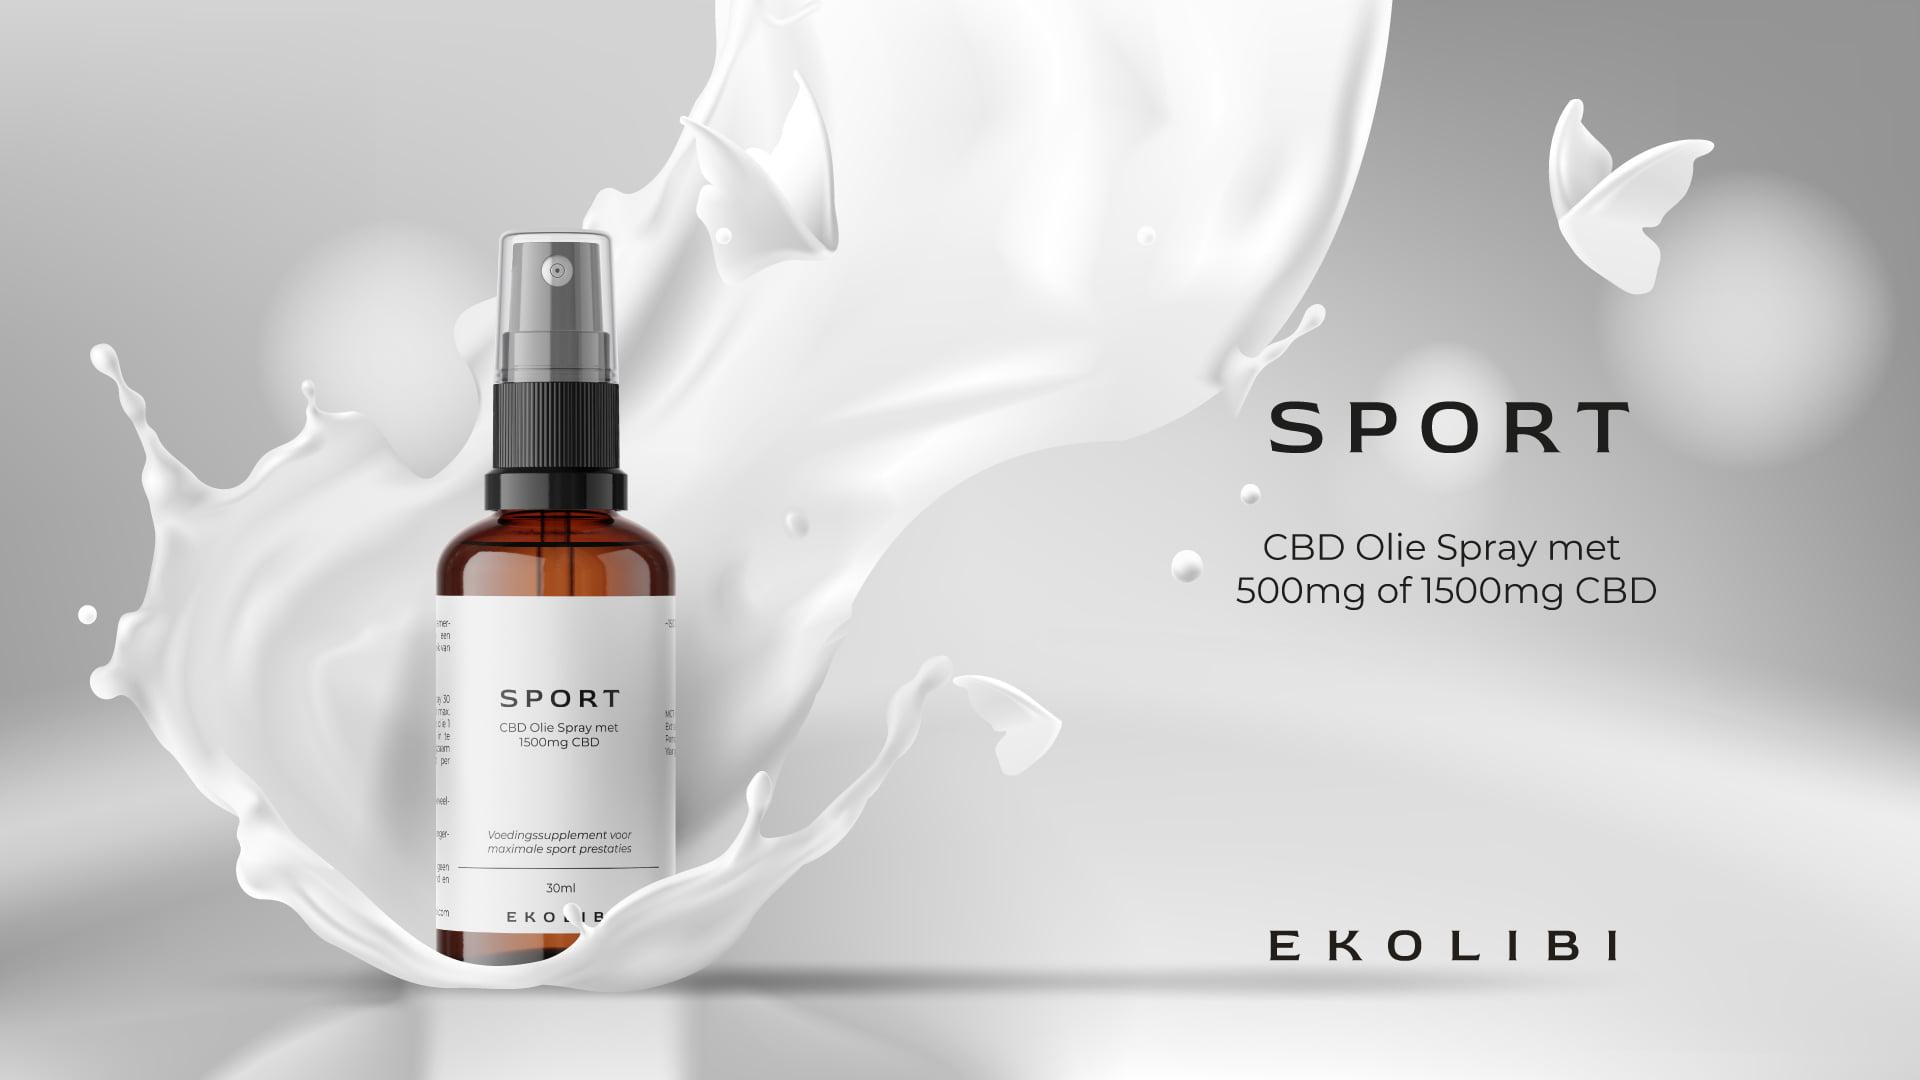 Ekolibi Sport CBD productpagina